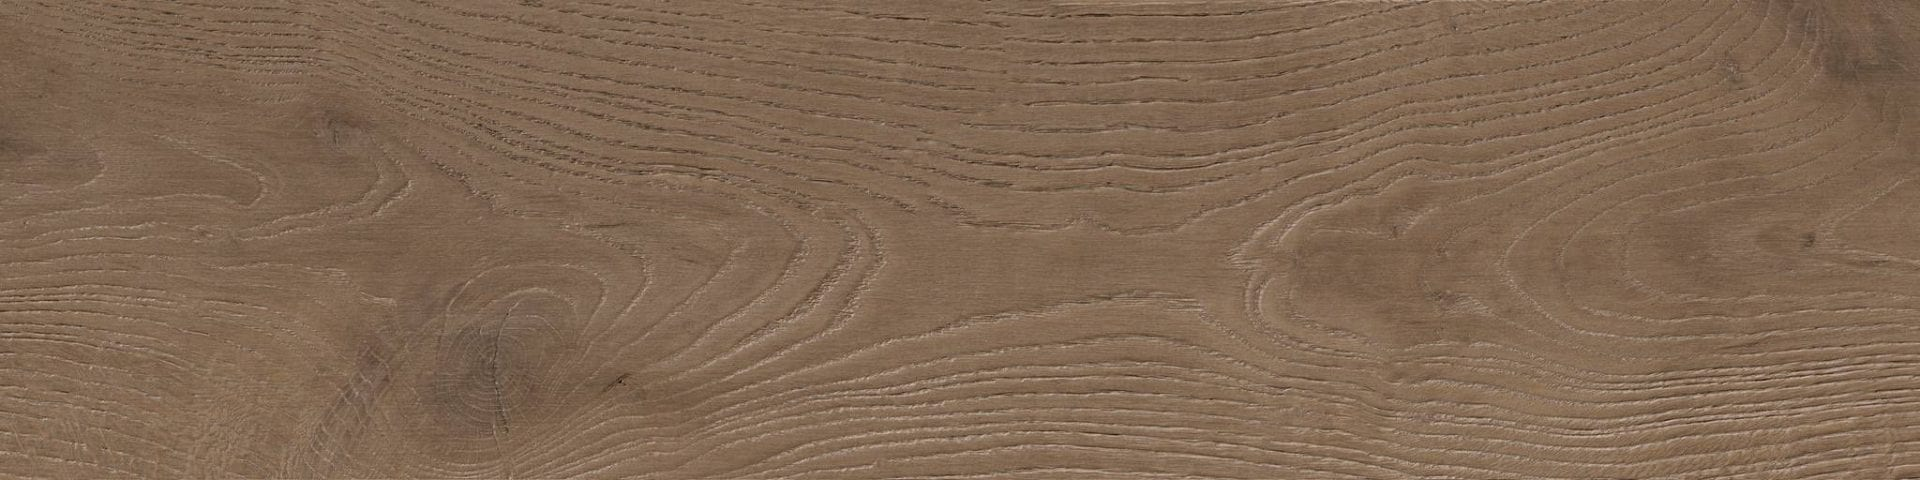 Serie ROVERE 225X90 porcelnico imitacin madera